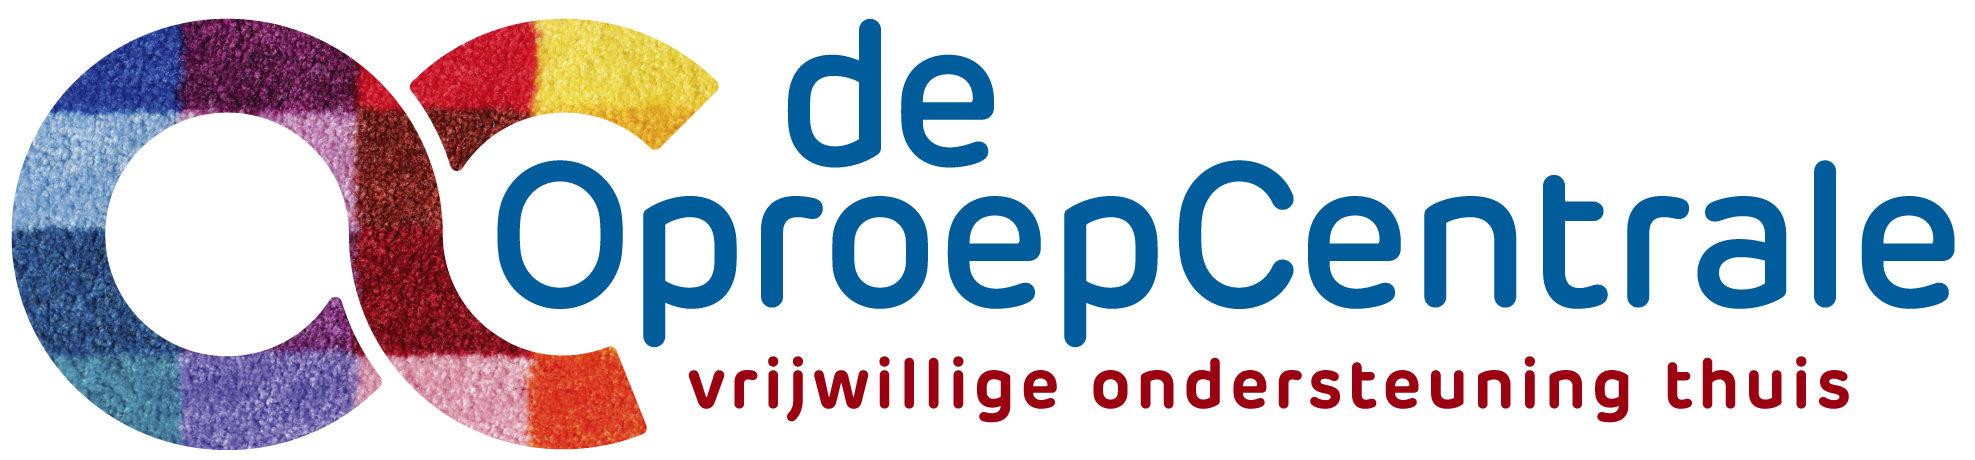 logo OproepCentrale